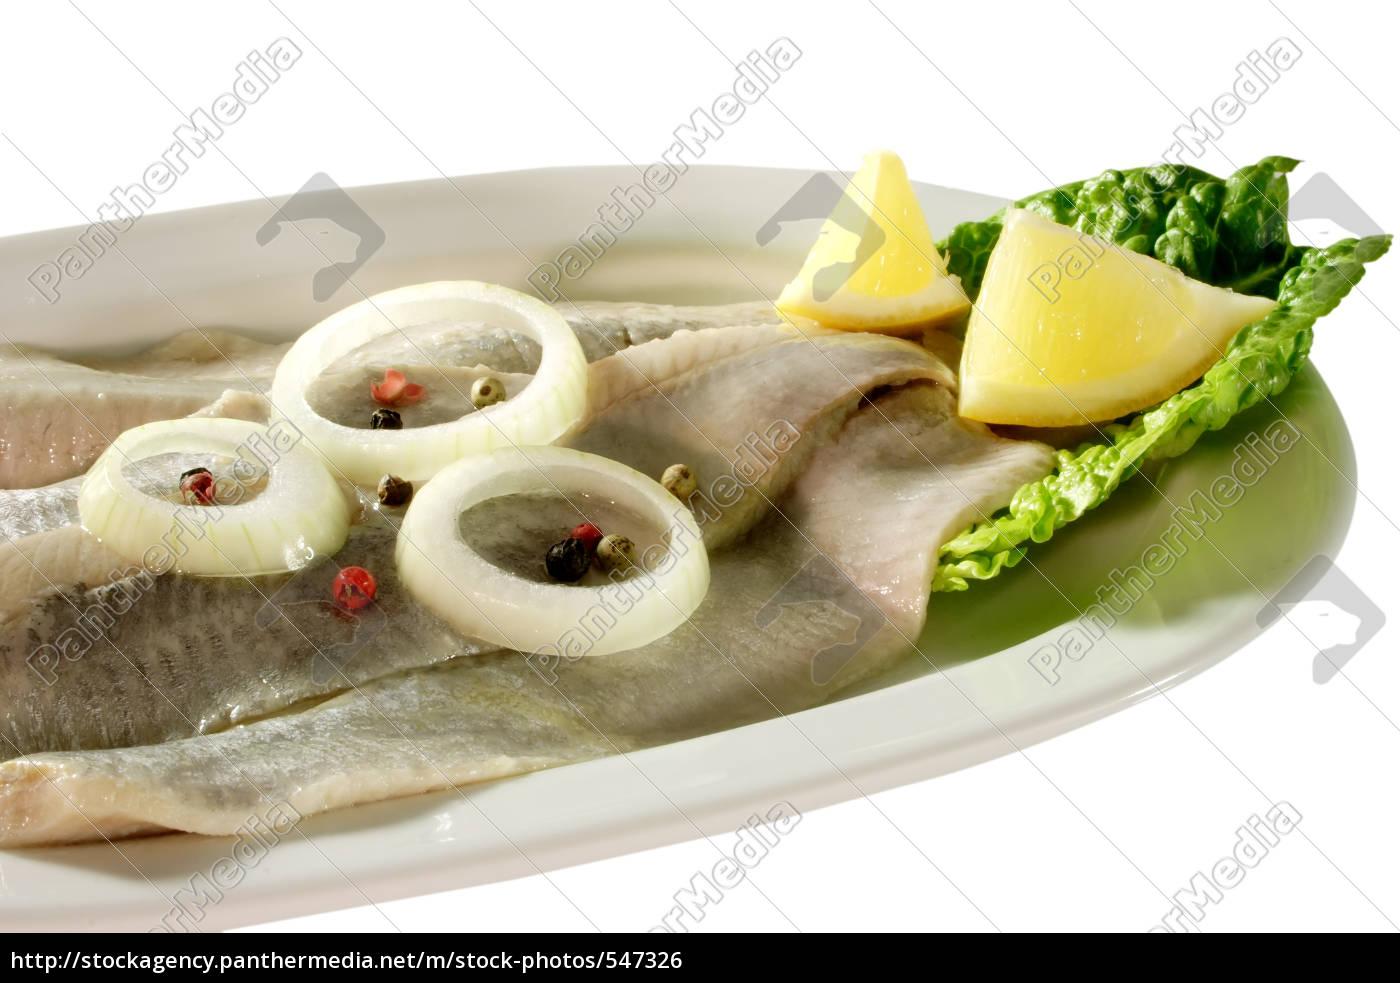 fish, product - 547326